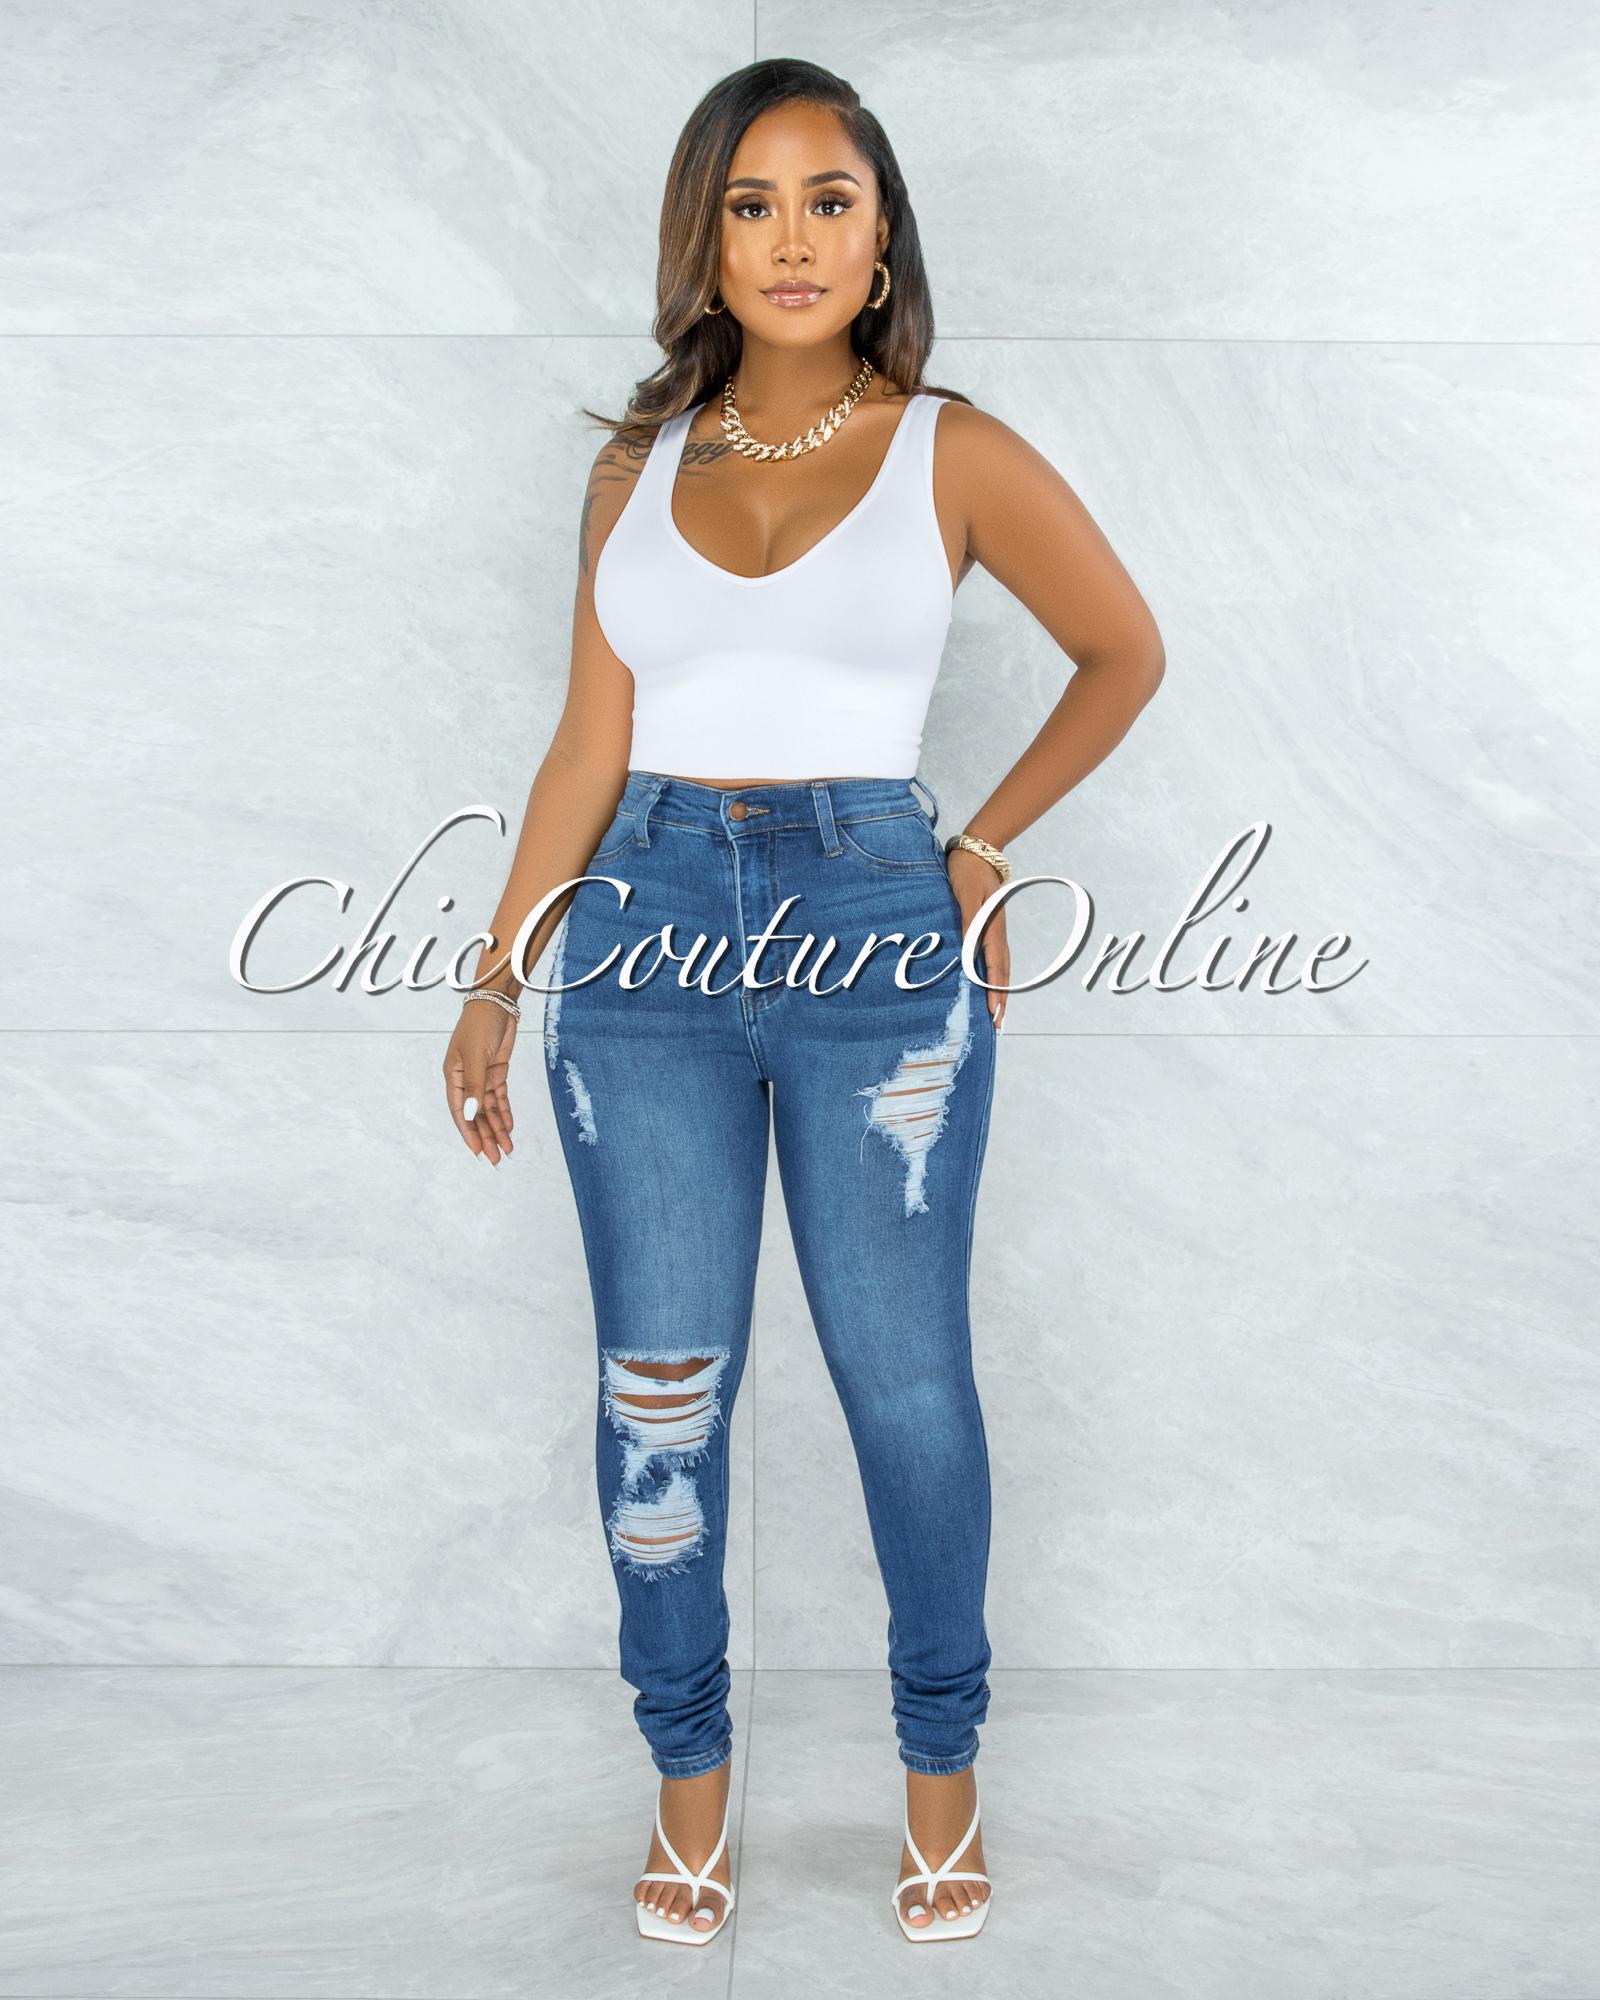 Electra Medium Denim High-Waist Distressed Skinny Jeans